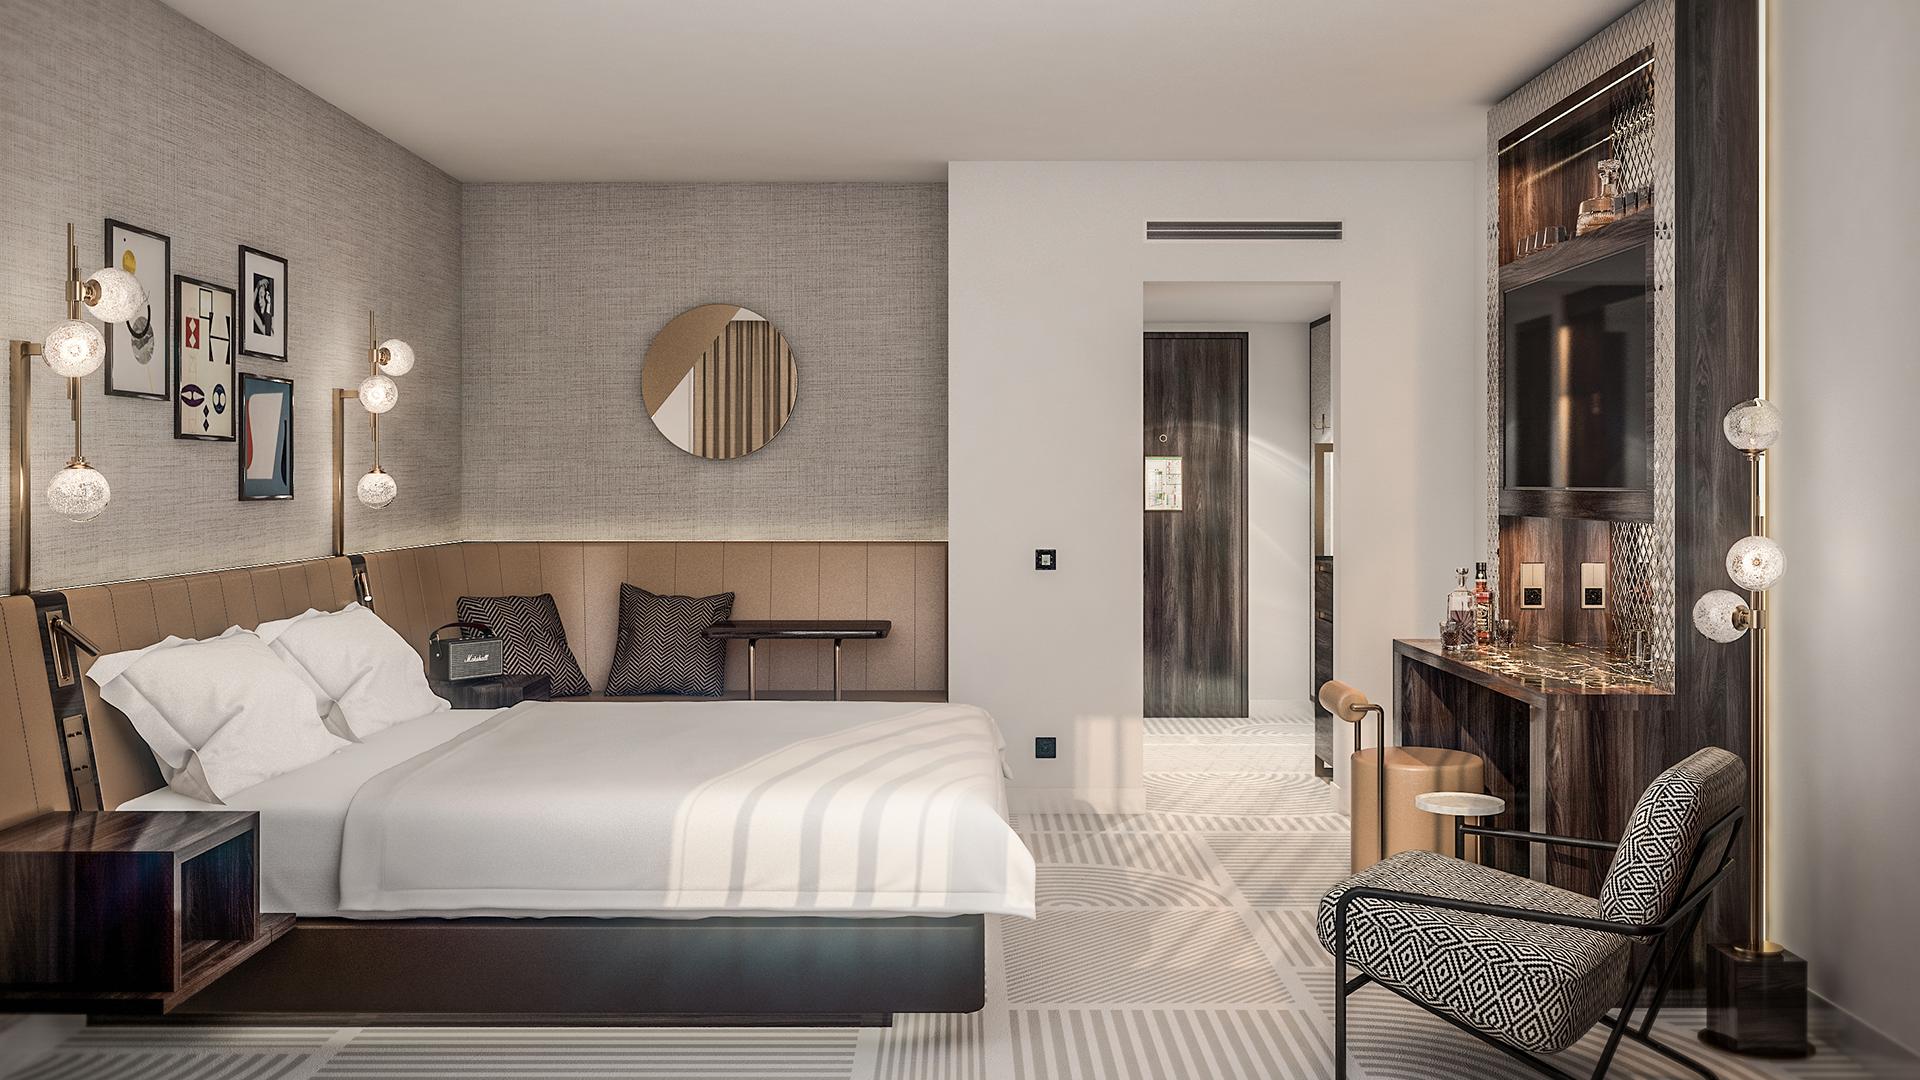 Deluxe Guest Room at Neues Schloss Privat Hotel Zürich